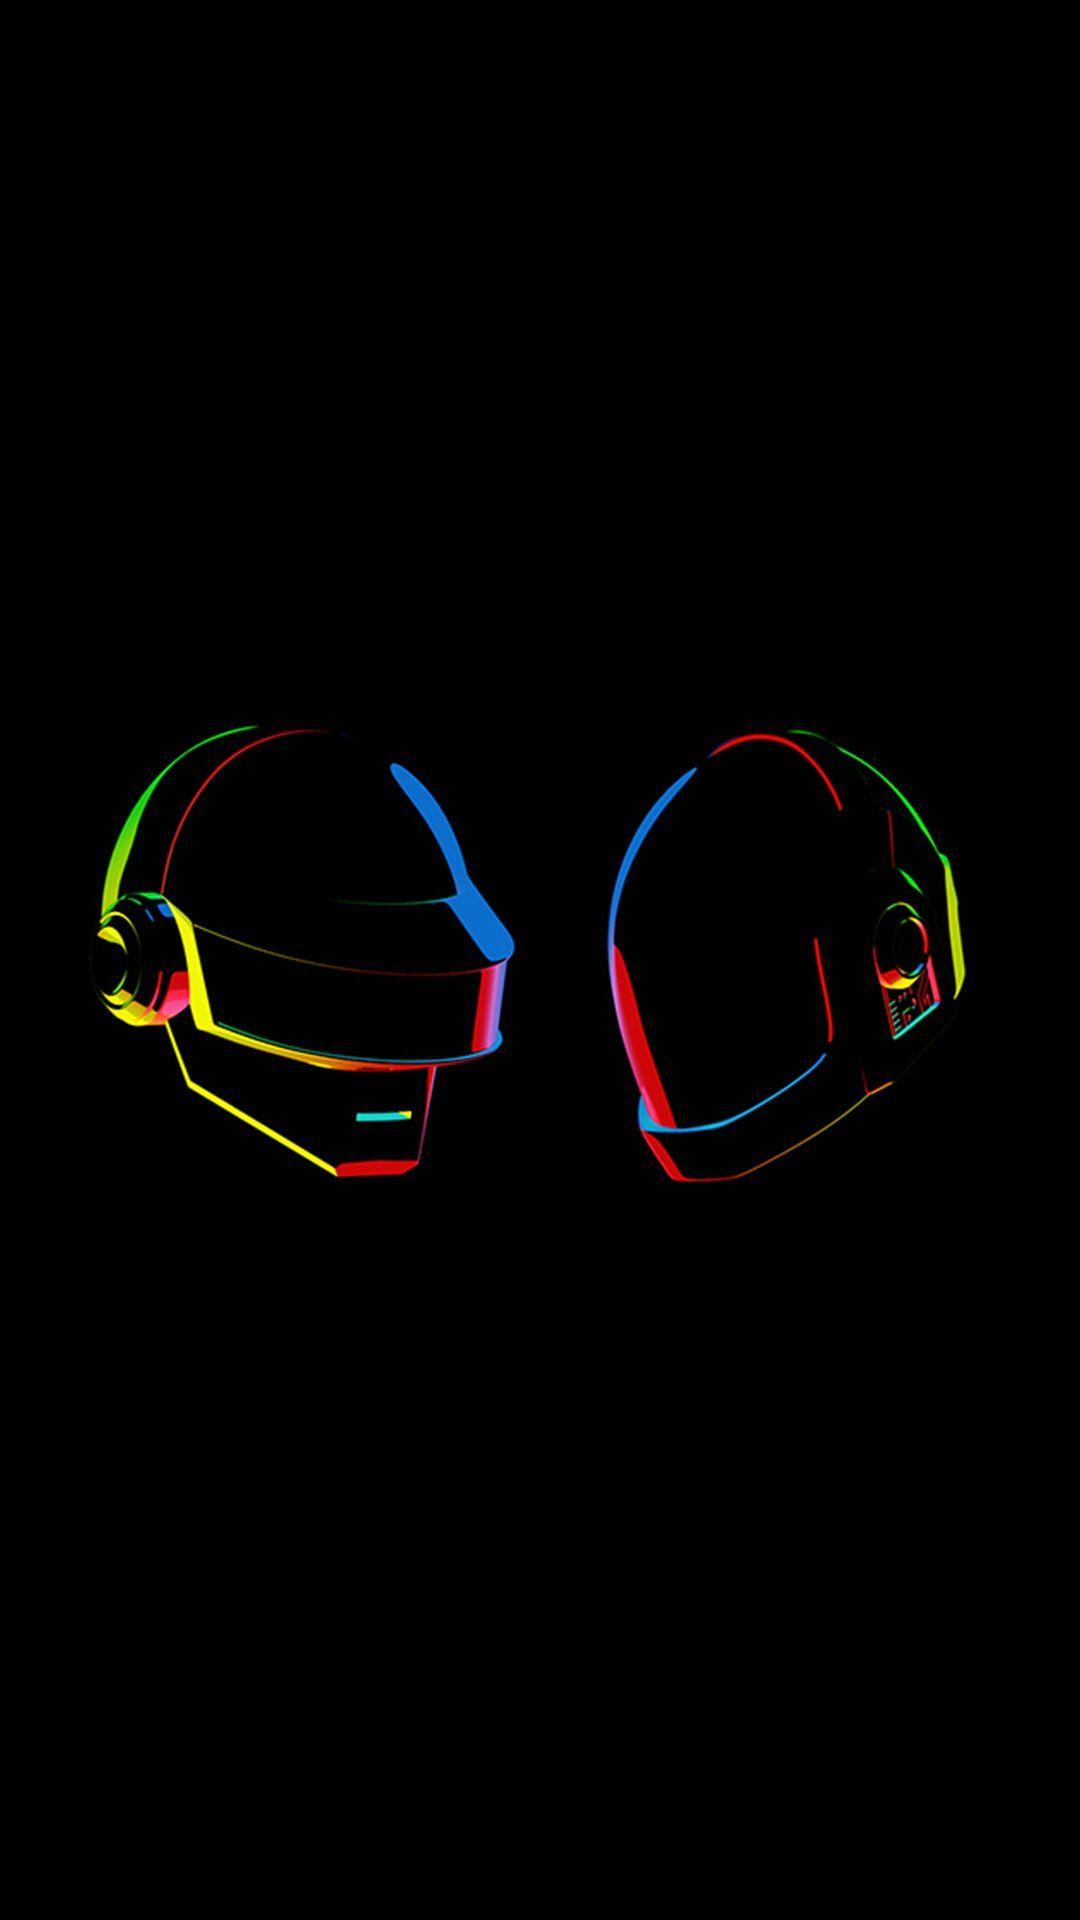 Idevicewallpapers On Twitter Daft Punk Punk Art Daft Punk Wallpapers